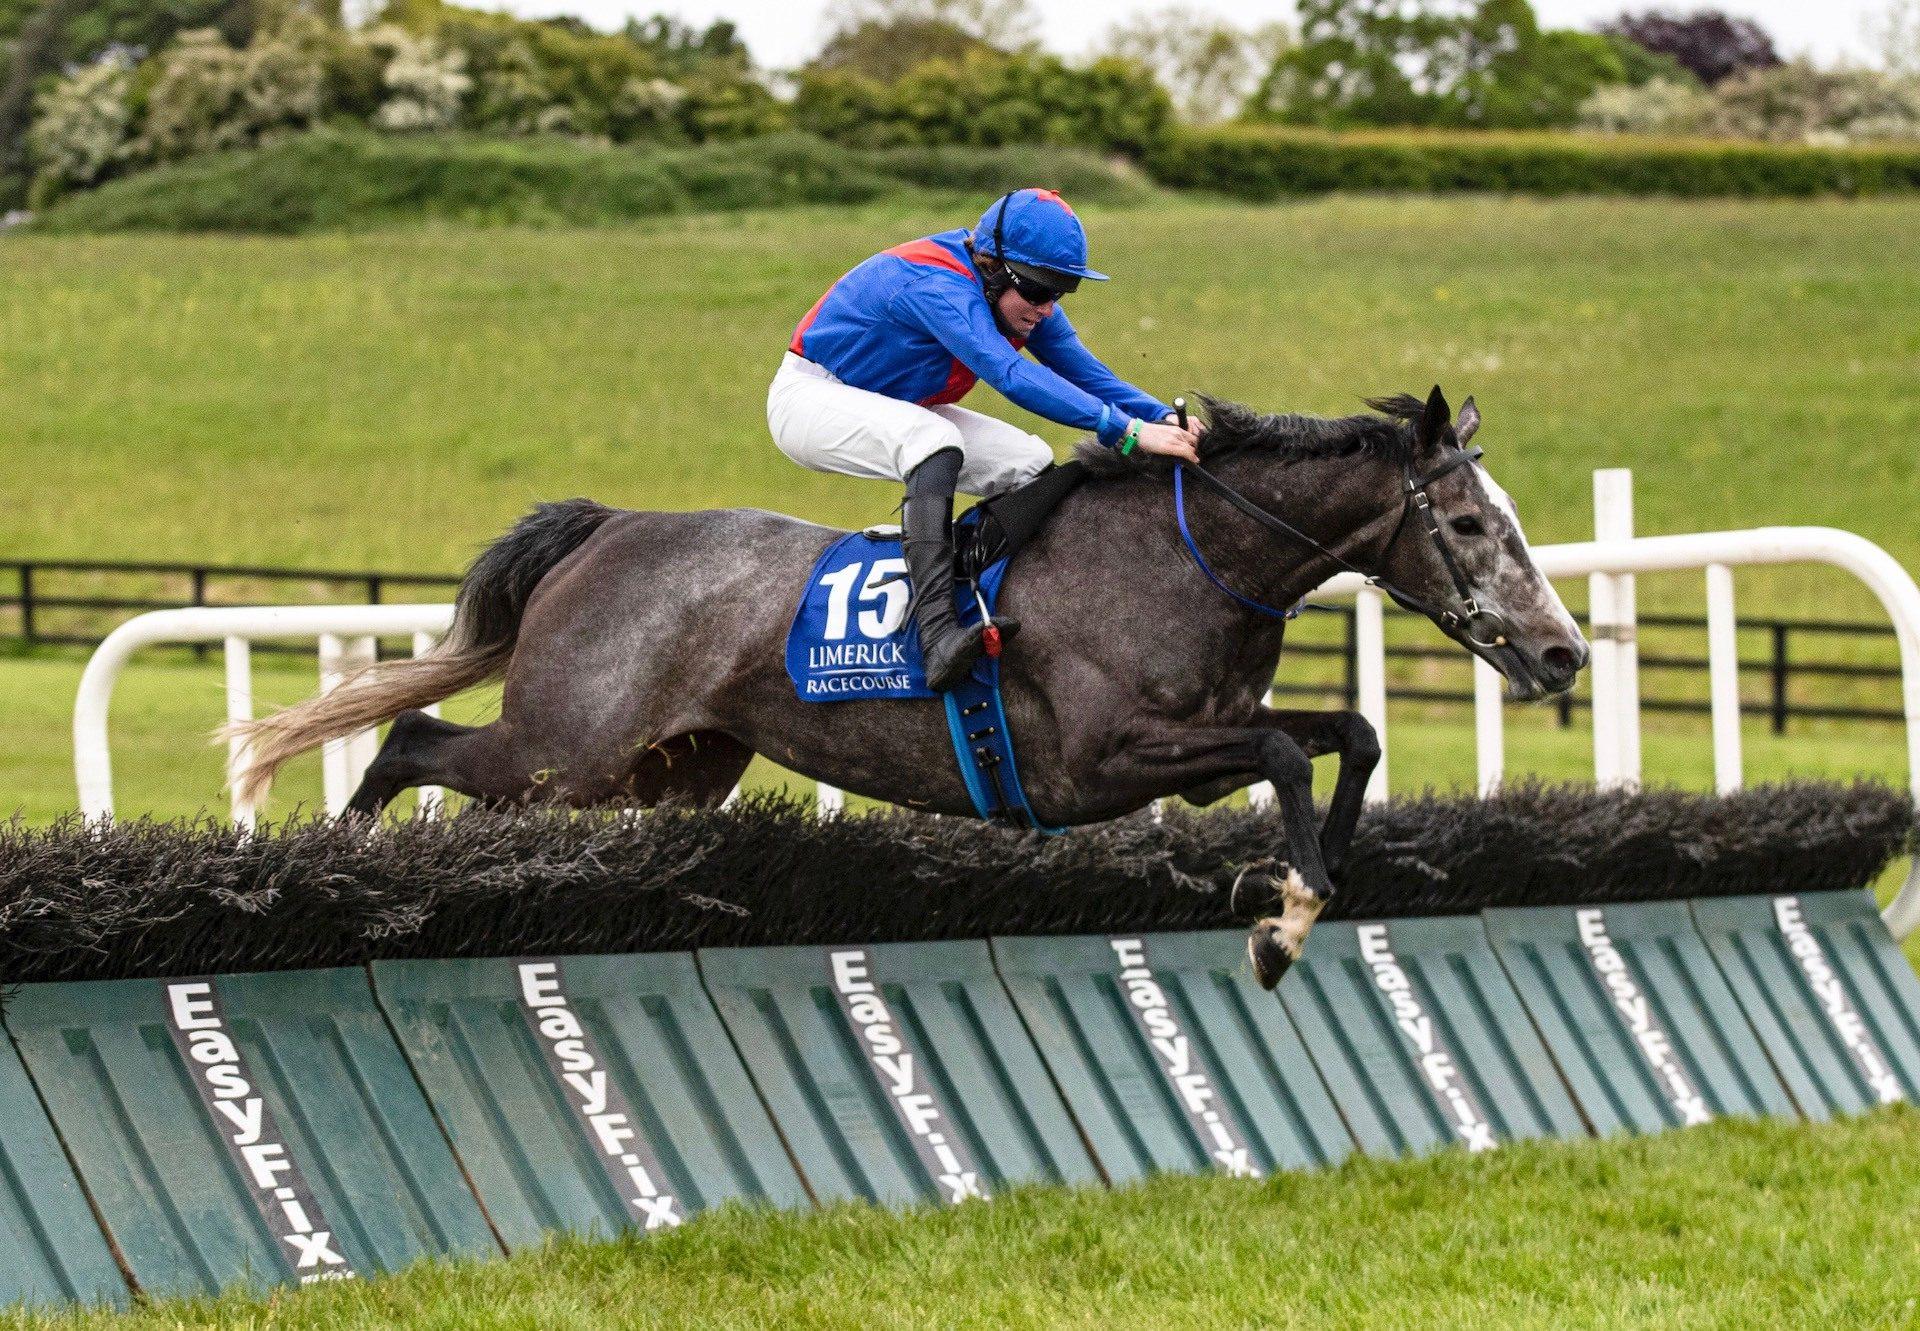 The Getaway Star (Getaway) Wins The Mares Maiden Hurdle At Limerick